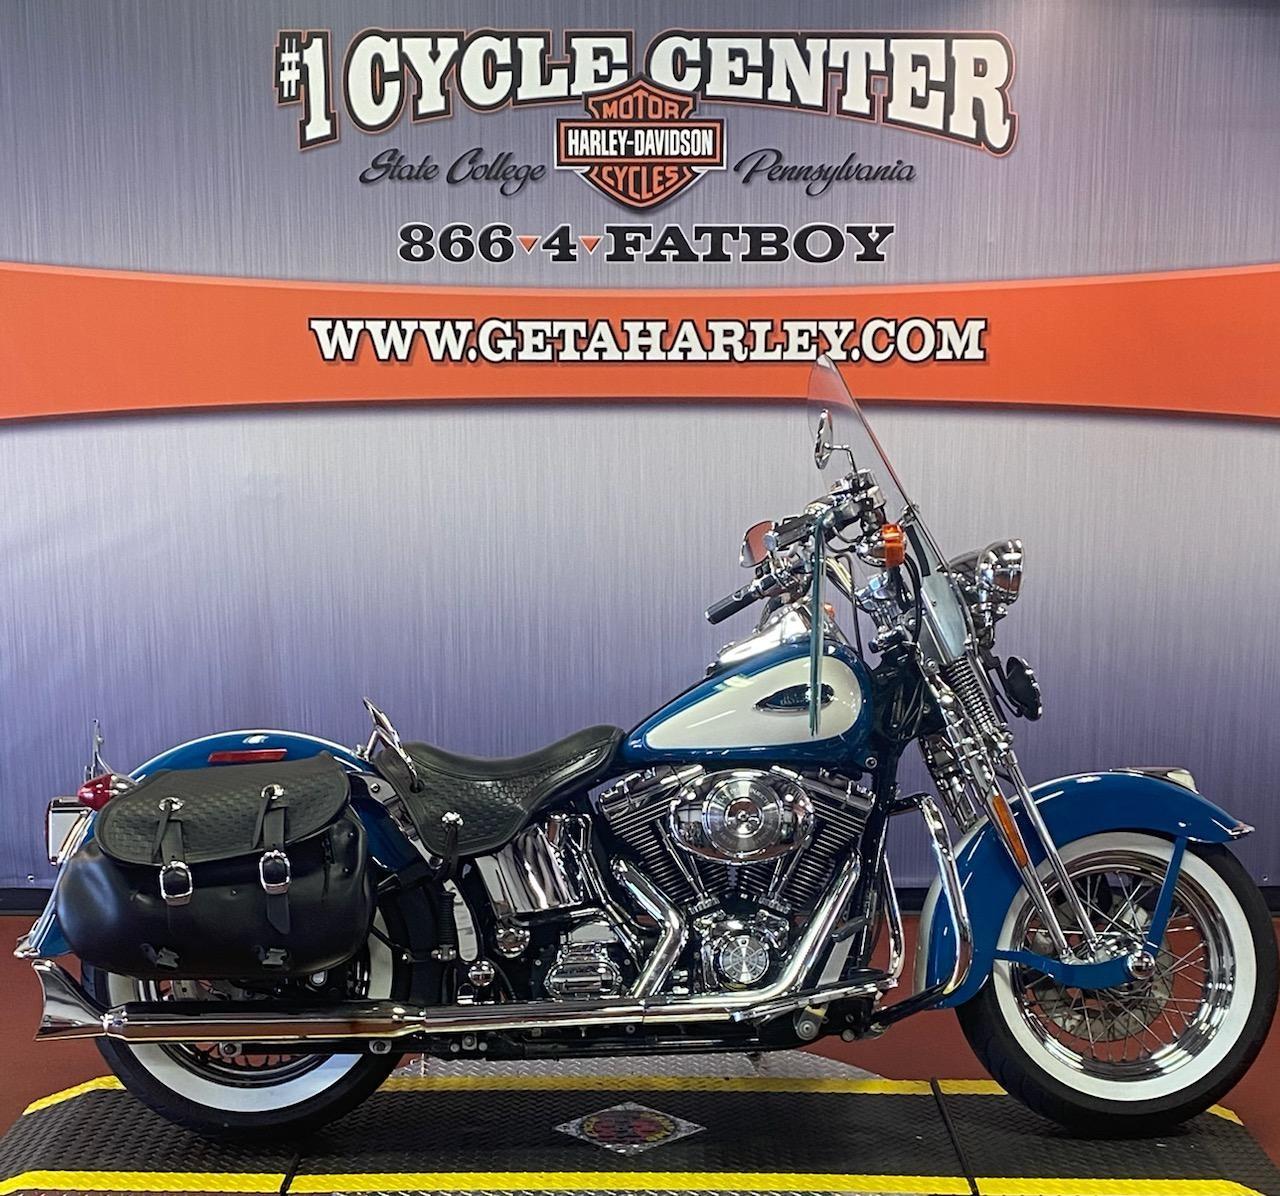 2001 Harley-Davidson FLSTSI at #1 Cycle Center Harley-Davidson